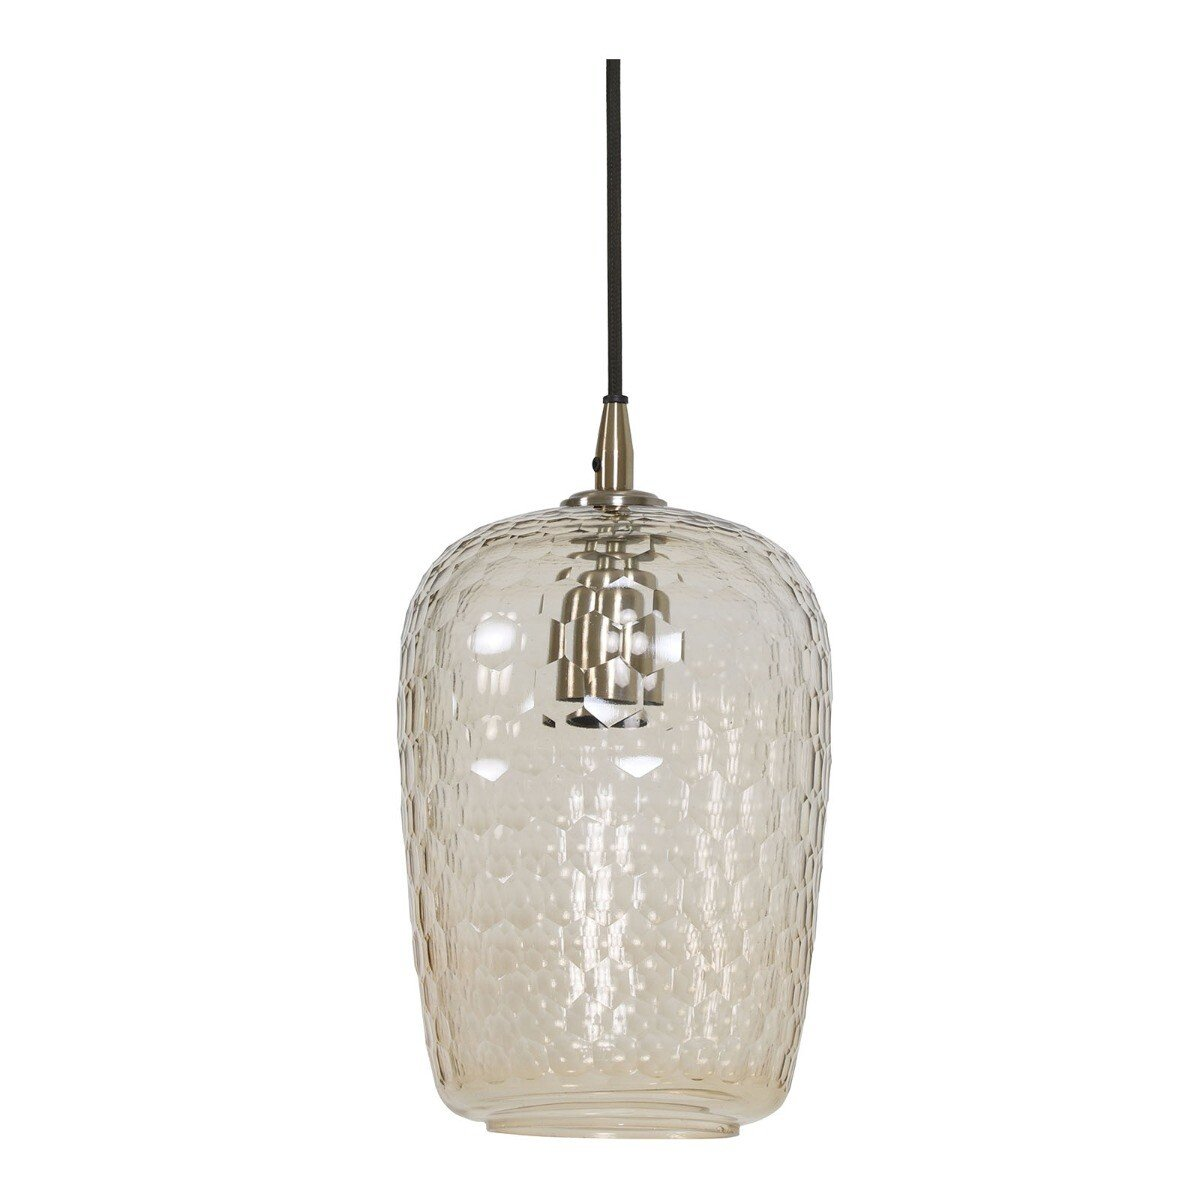 Light & Living Hanglamp DELICA glas antiek brons